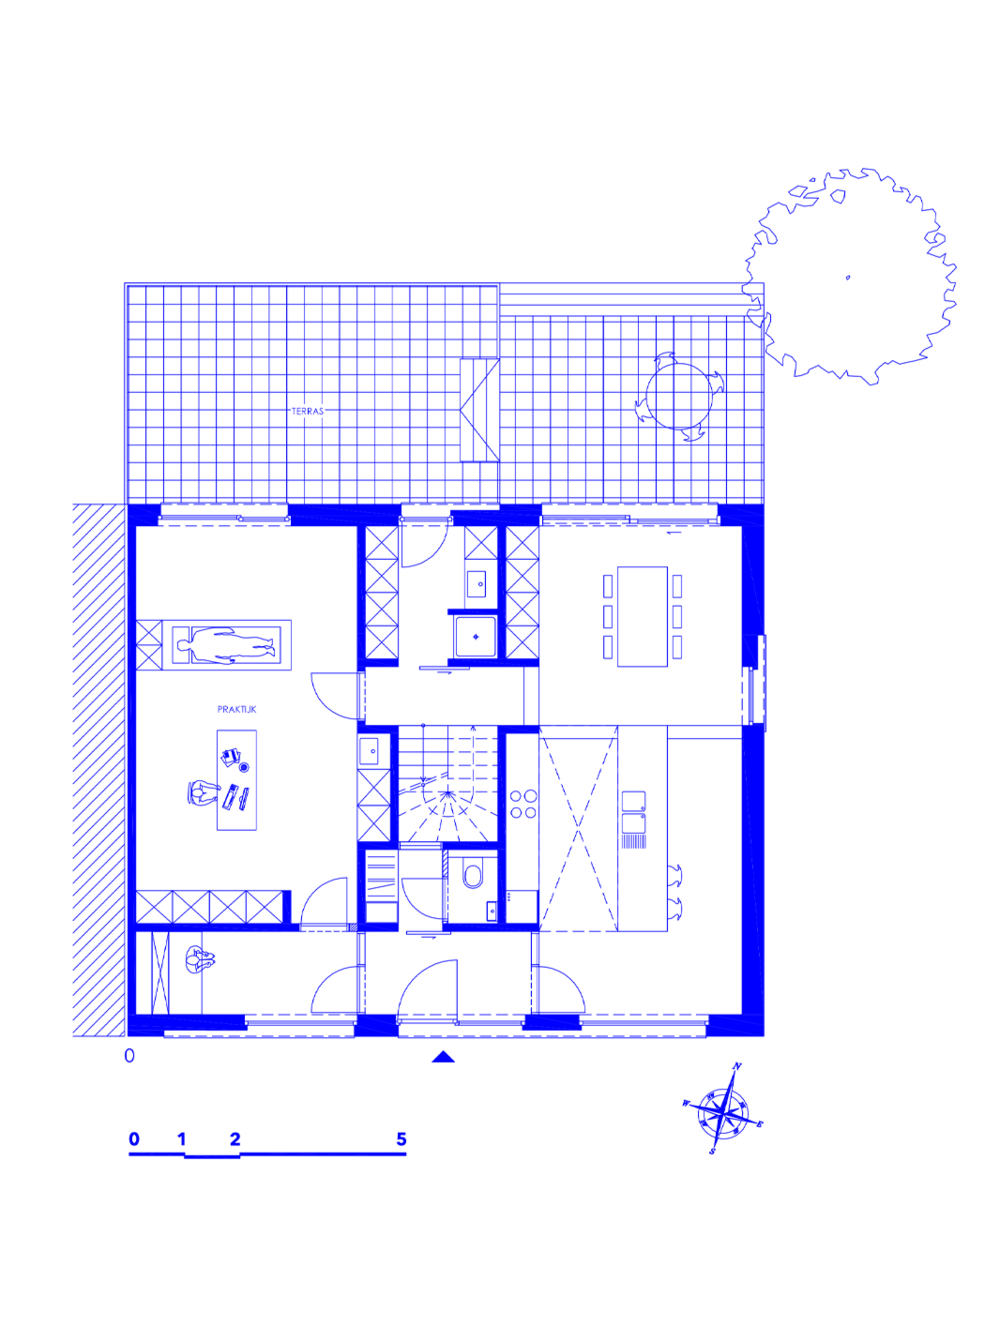 MO-huis_in_het_gabarit-grondplan_niv0.png